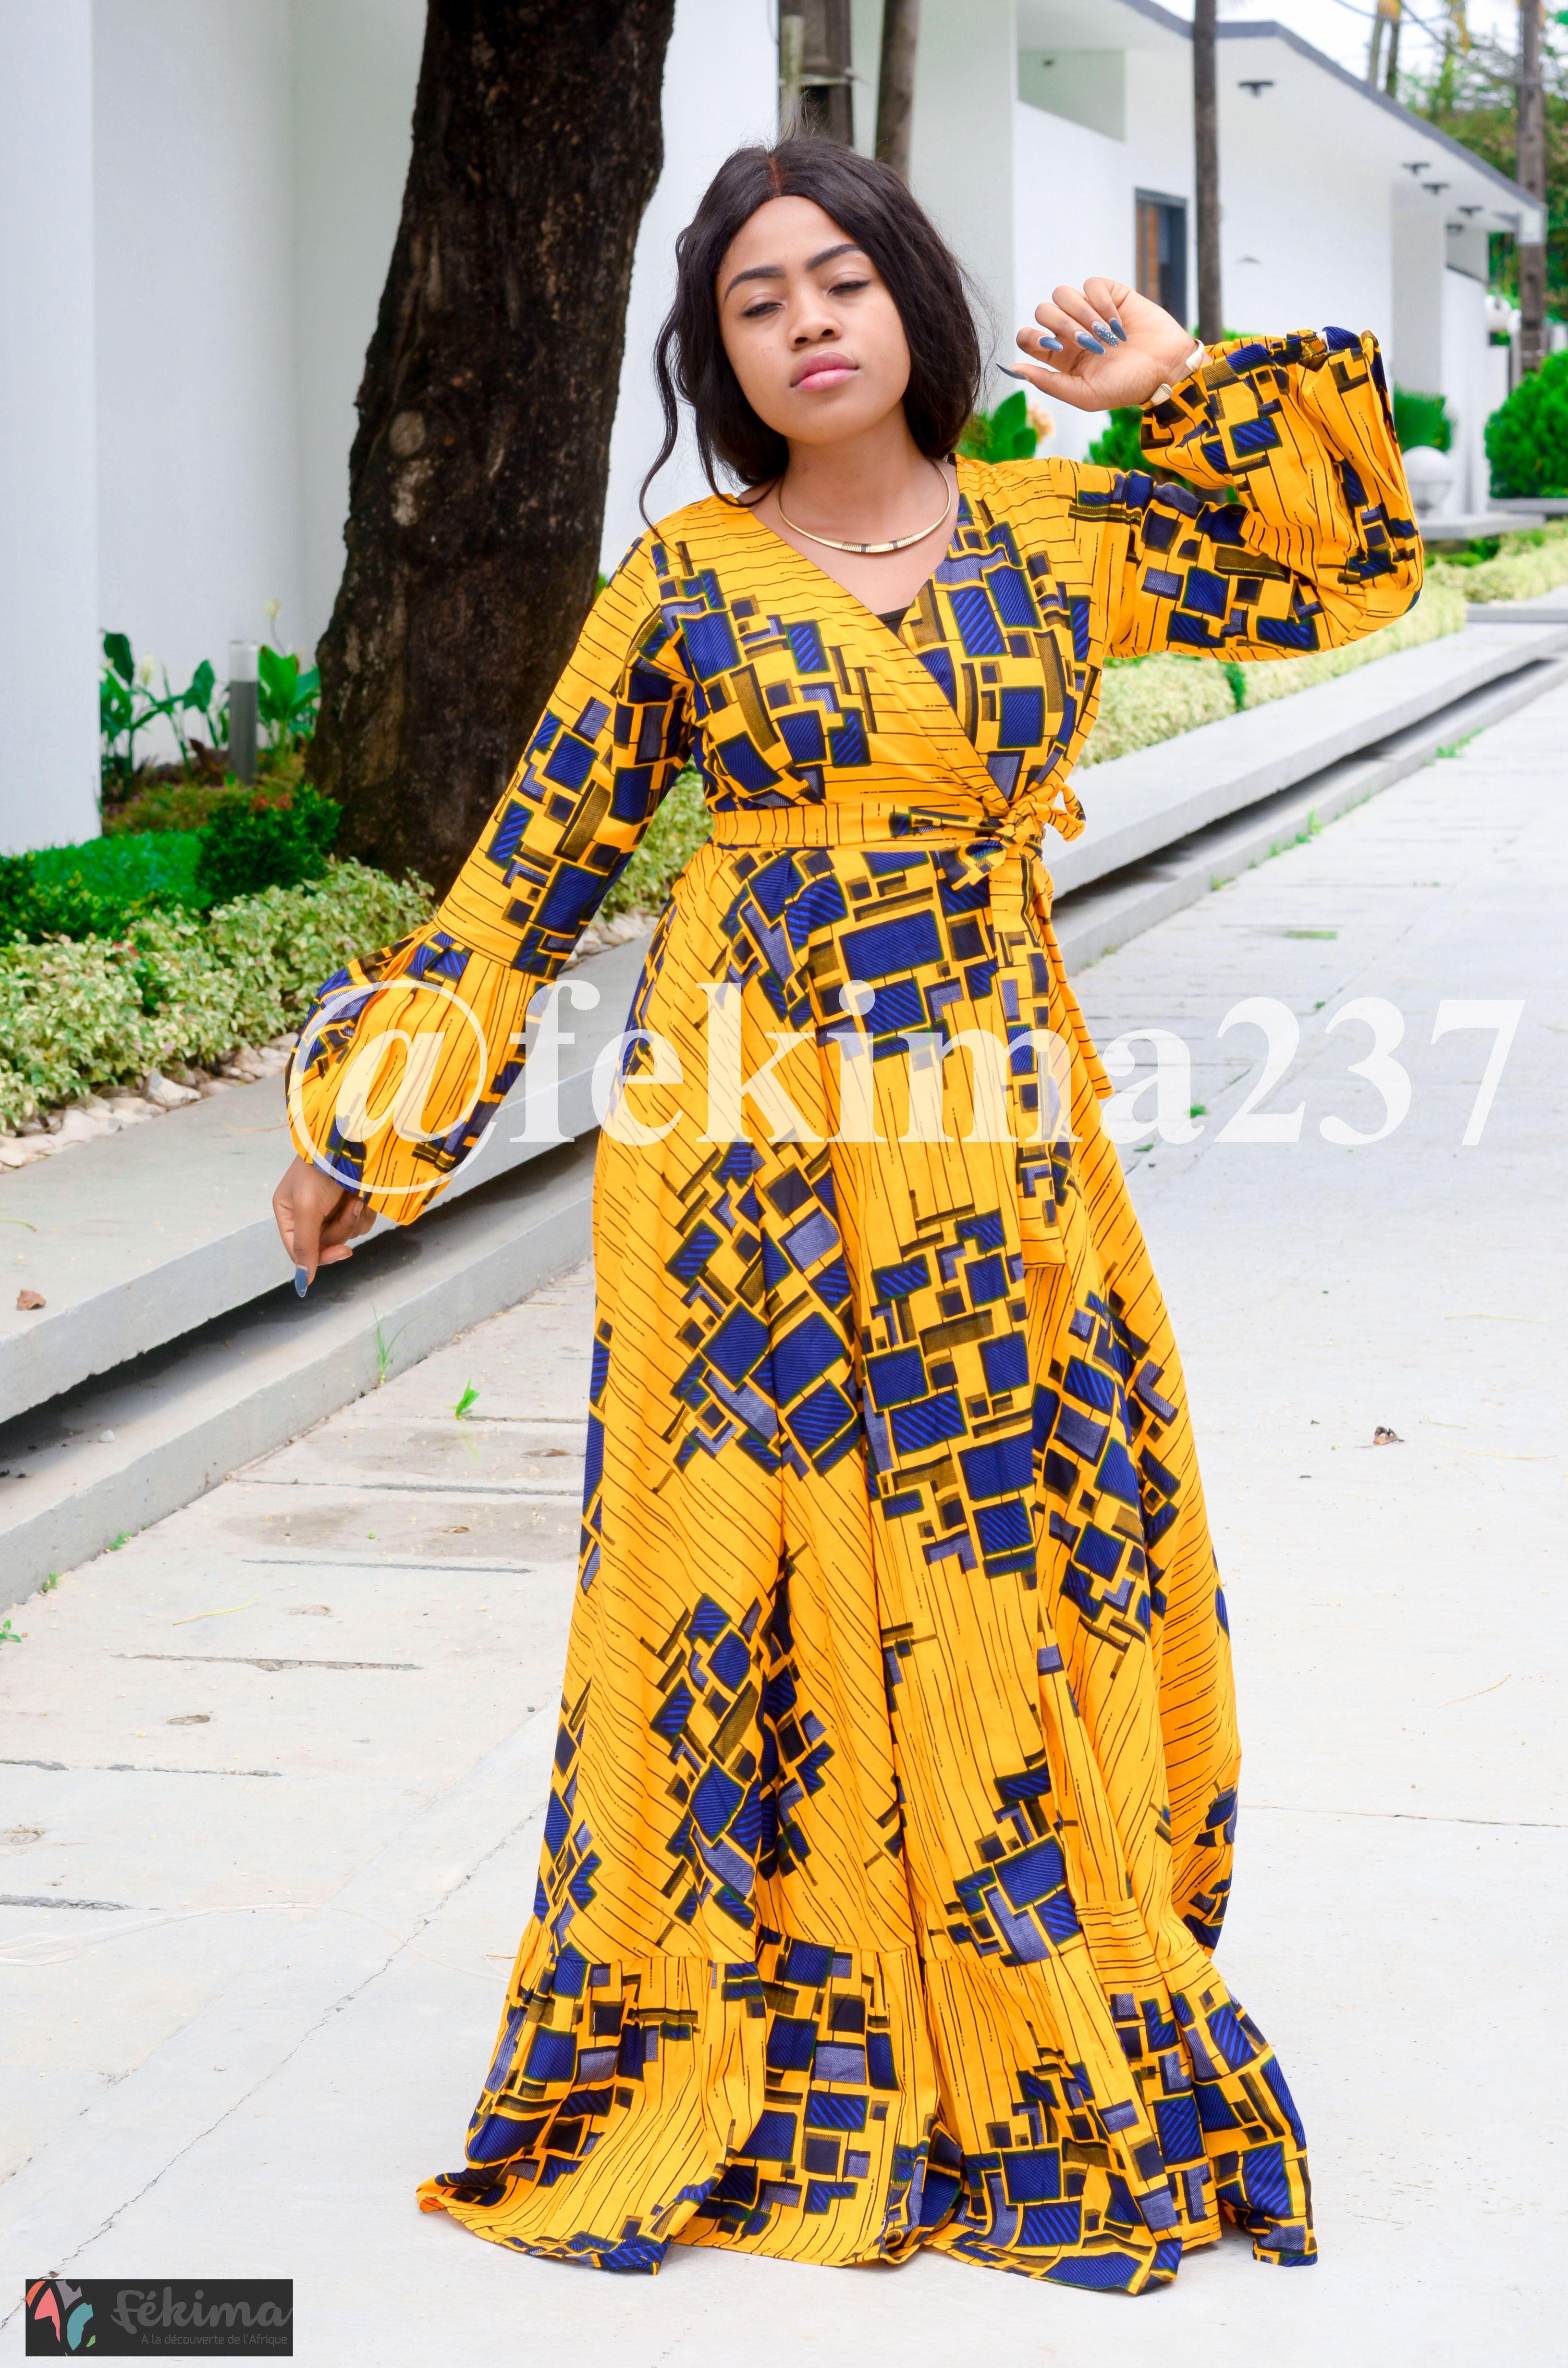 Robe Portefeuille Longue Igbo Robe Portefeuille Longue Mode Africaine Robe Longue Mode Africaine Robe